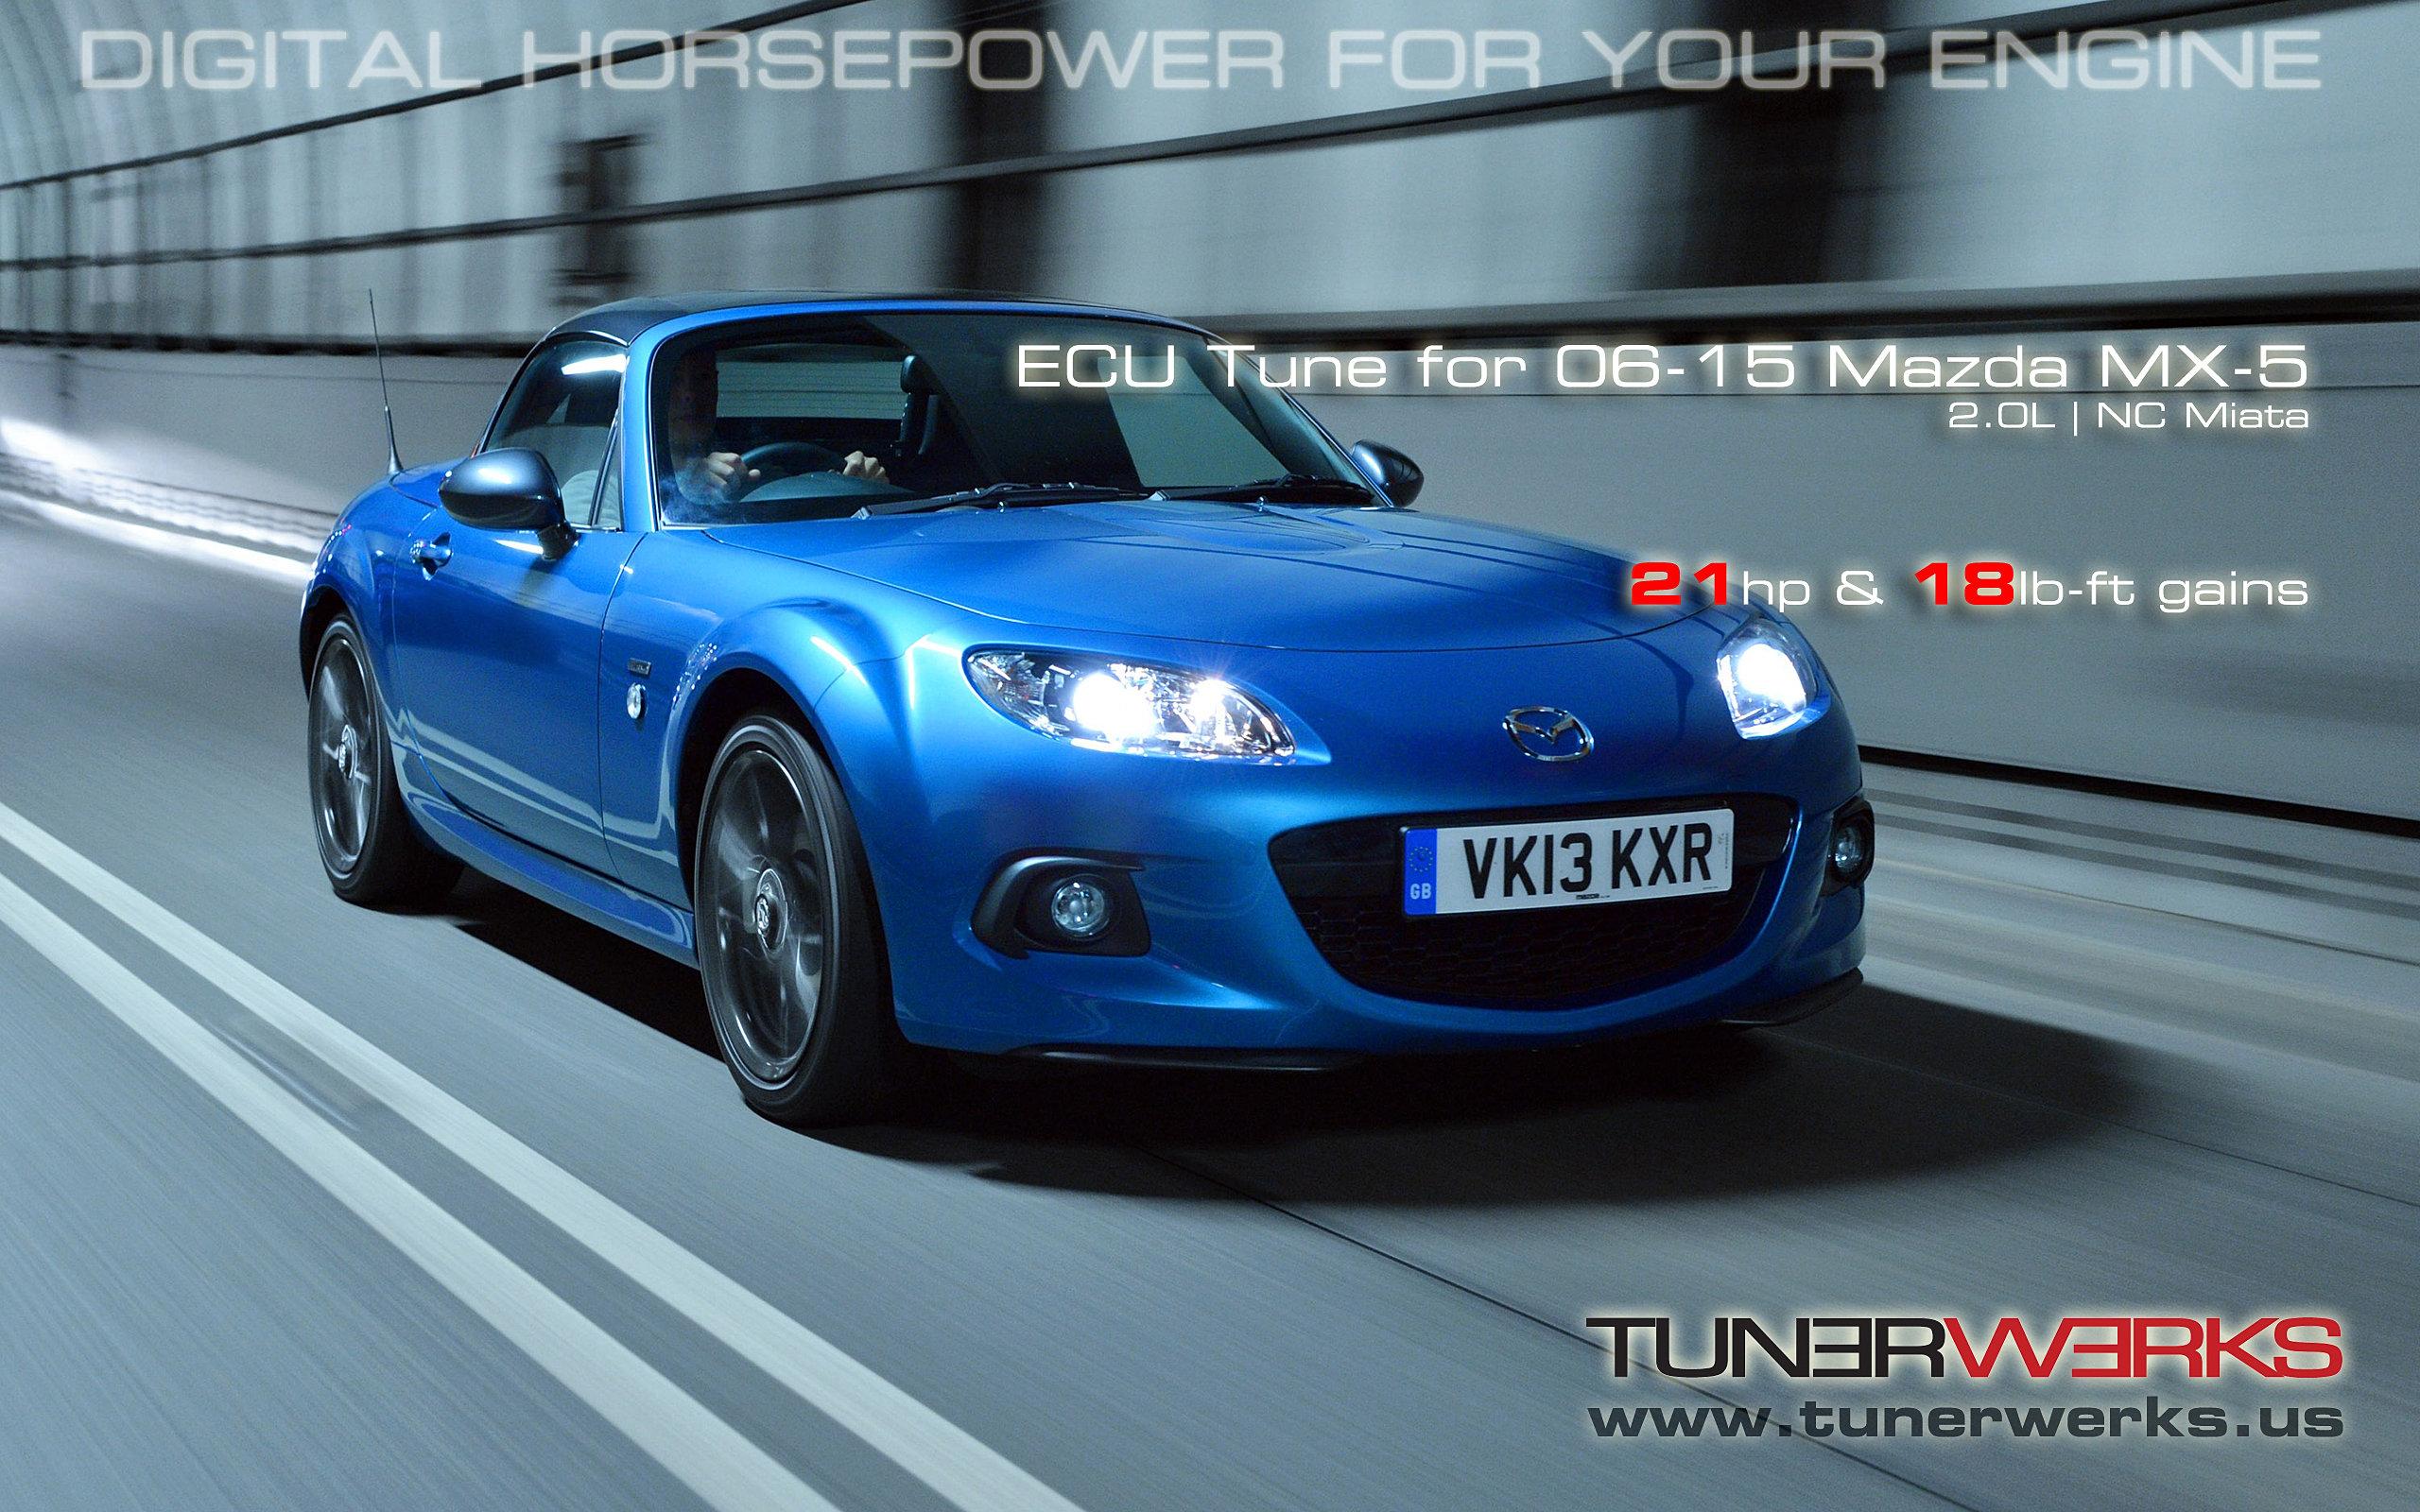 tunerwerks ecu tuning distributor for european cars. Black Bedroom Furniture Sets. Home Design Ideas